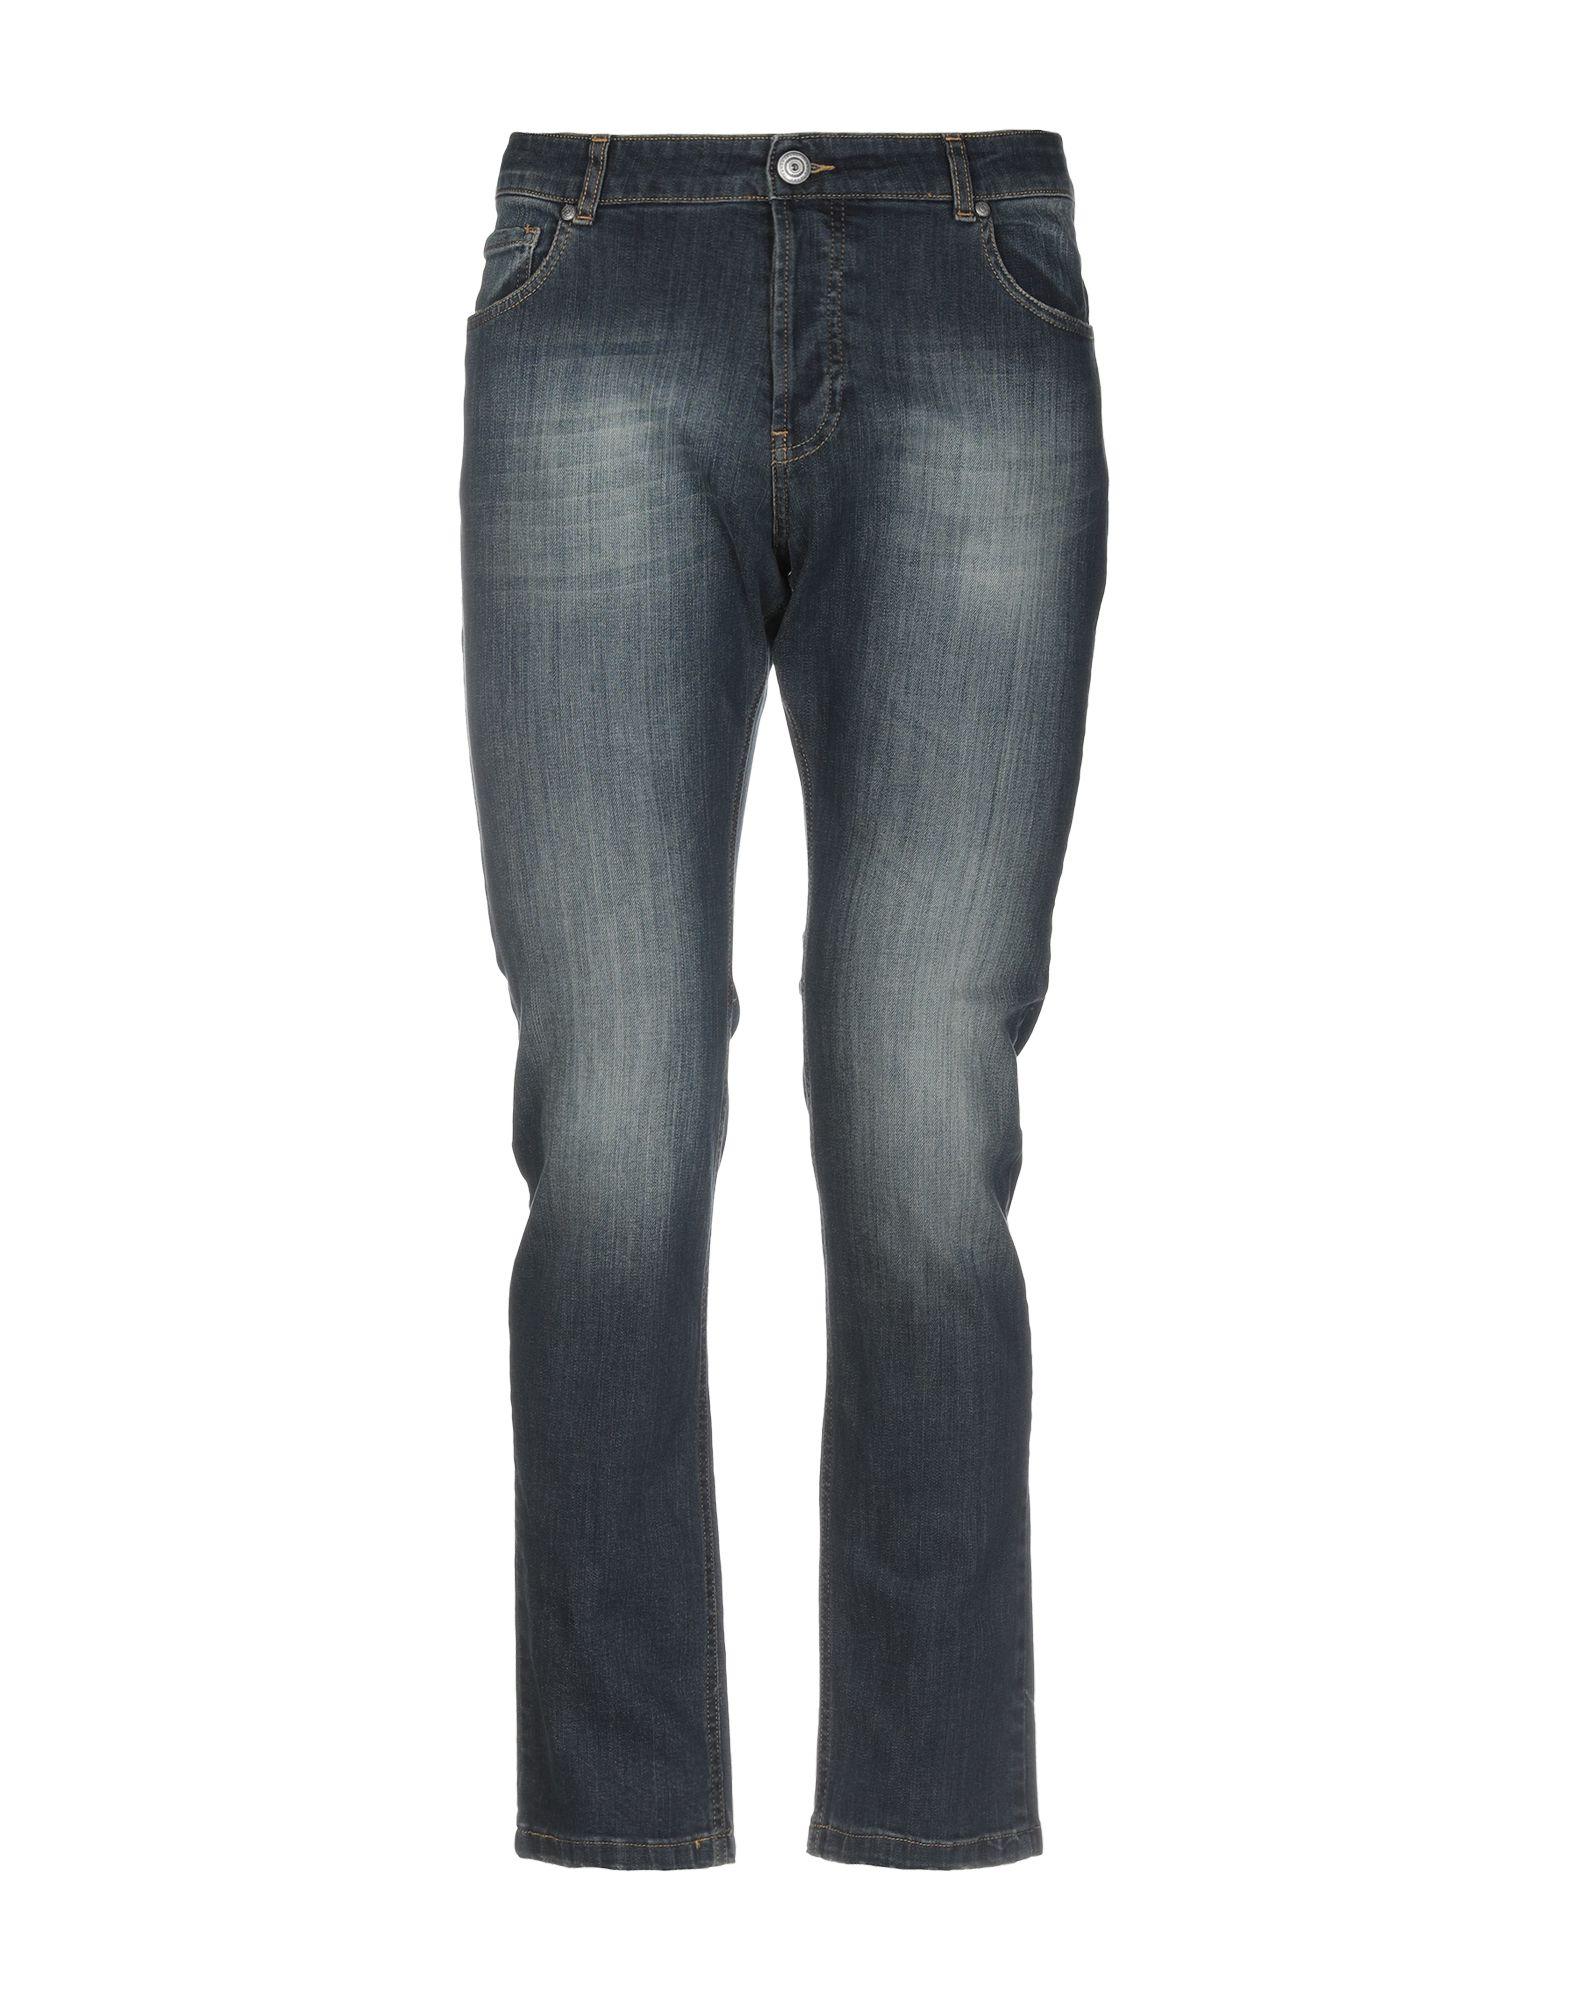 Фото - PETER HADLEY SPORT Джинсовые брюки peter hadley sport футболка